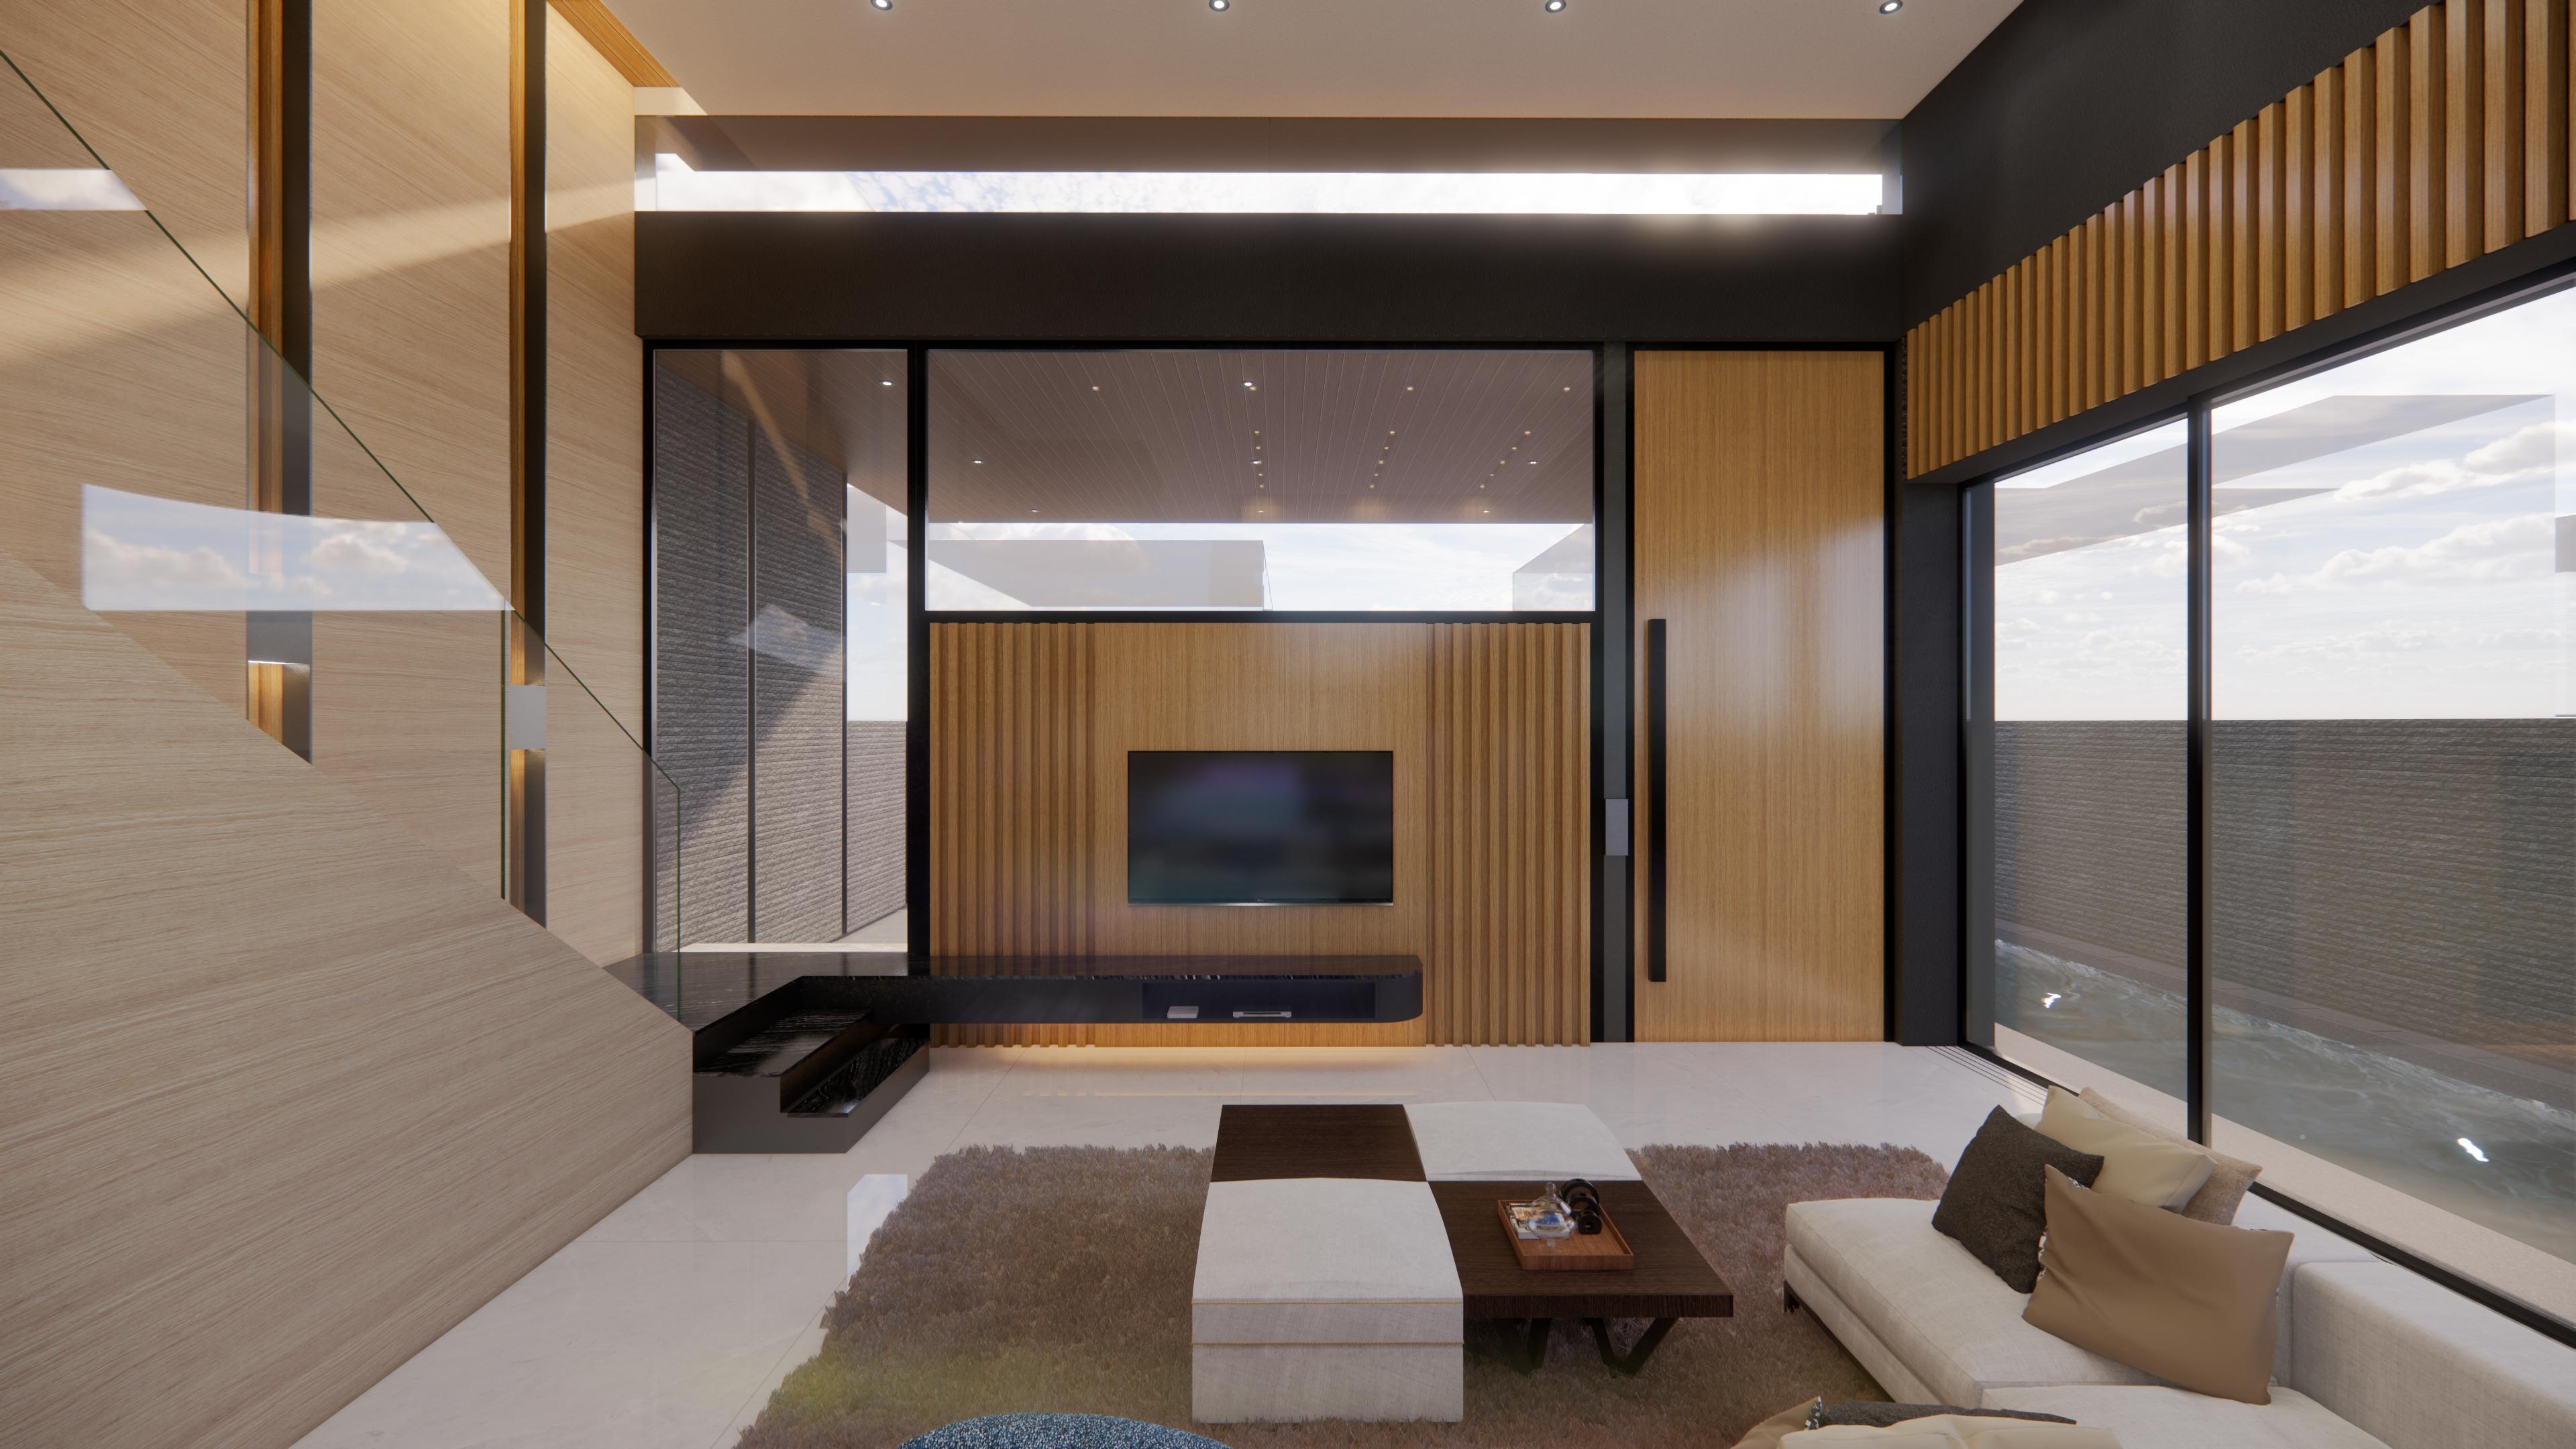 Brockhampton_Living Room 2